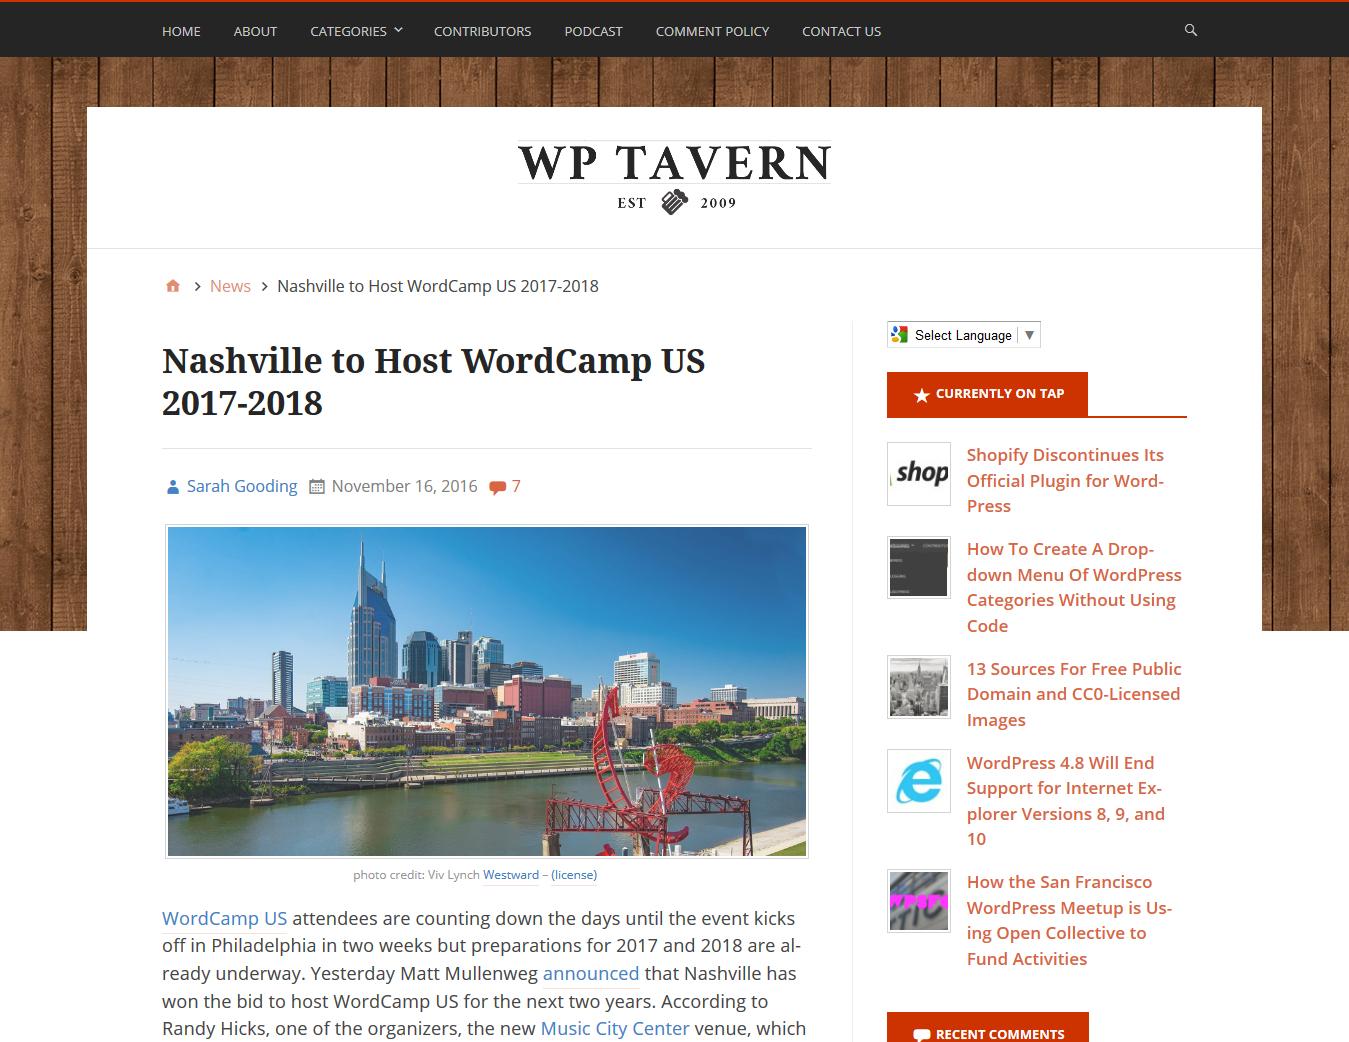 screenshot-wptavern.com 2017-05-01 01-40-54.jpg